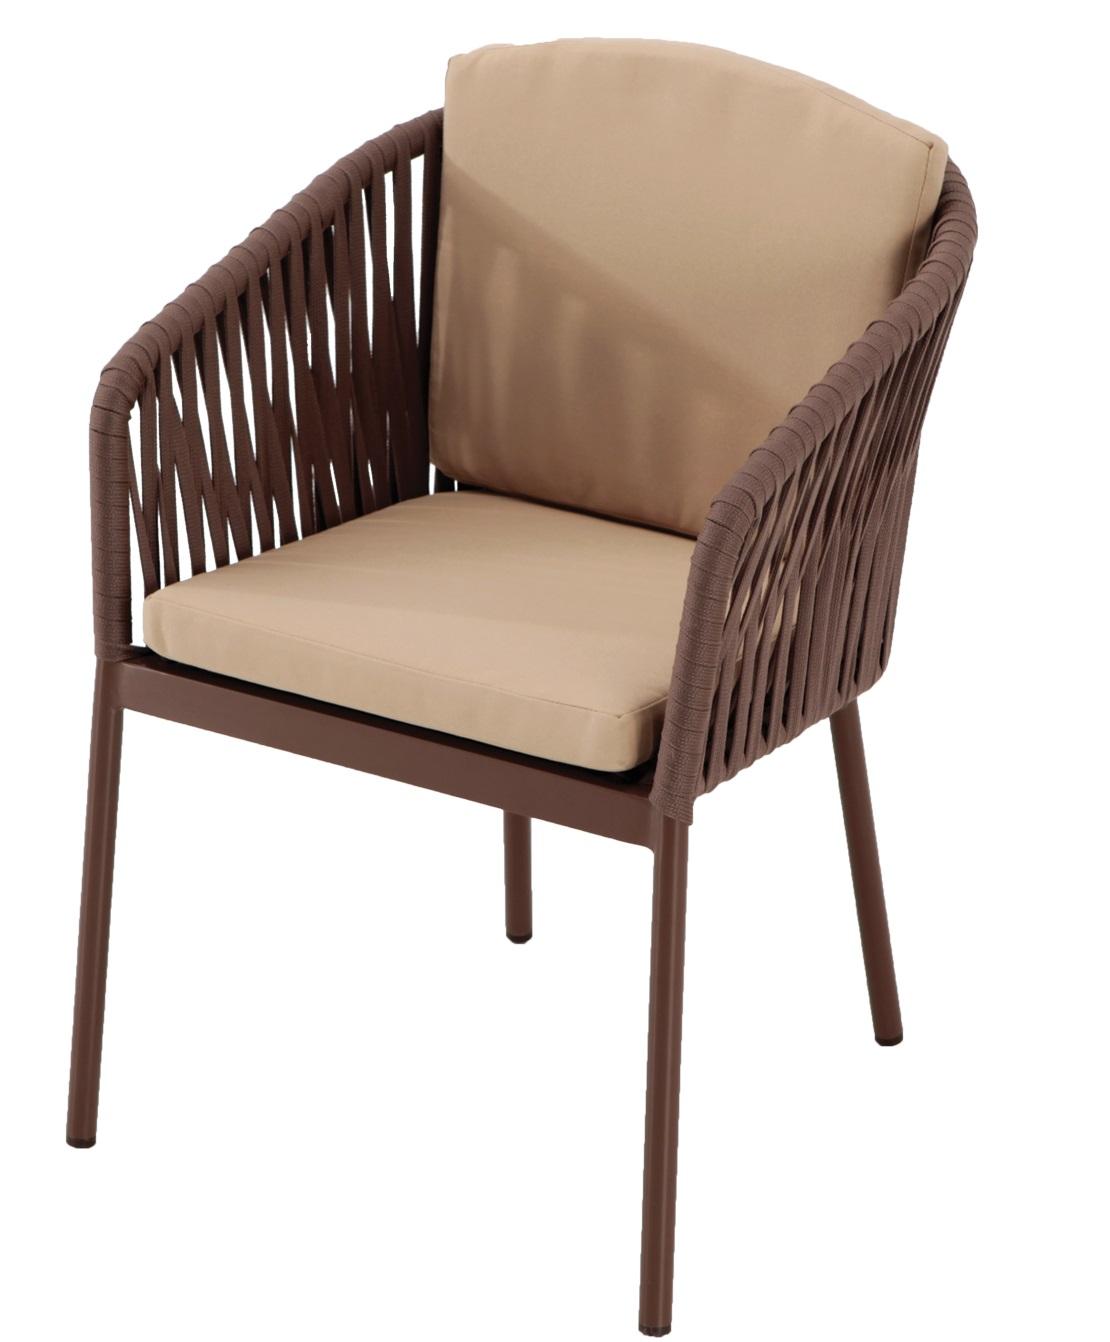 sillas co respaldo curvo terraza